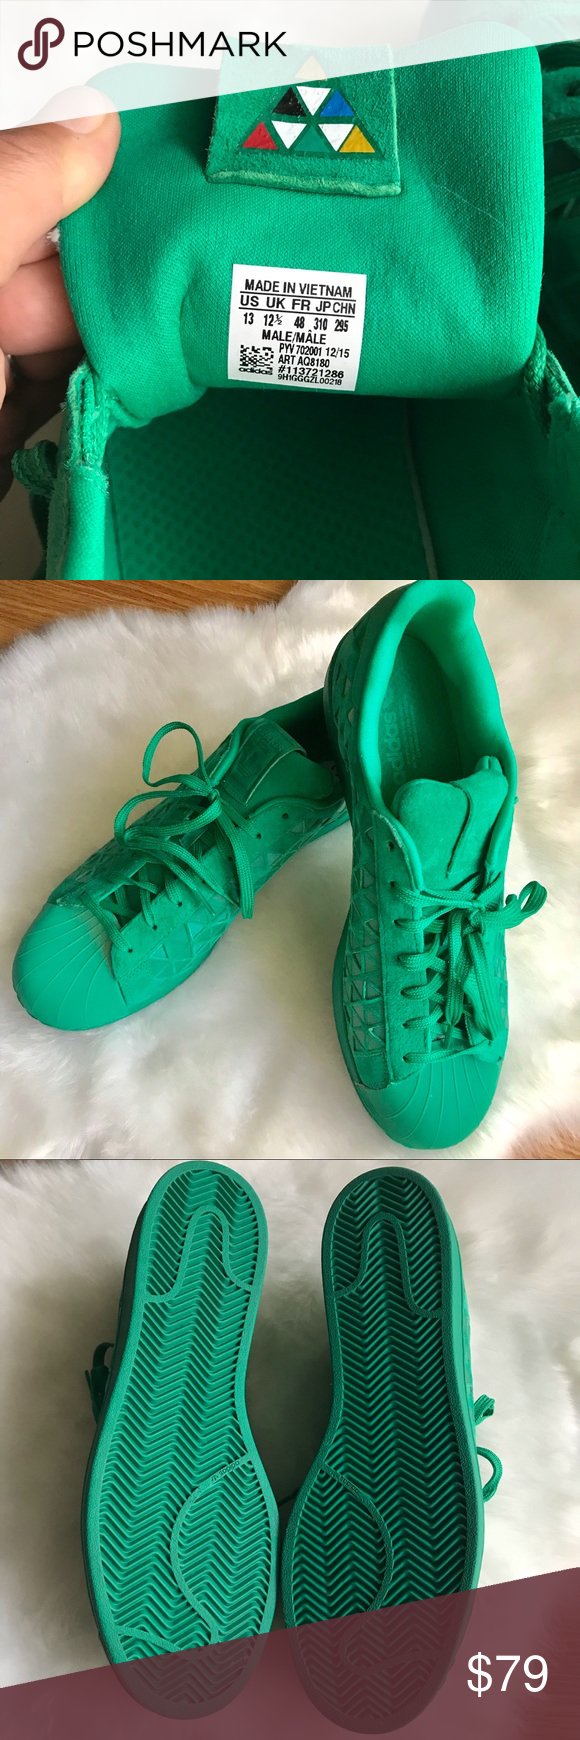 adidas originals superstar xeno reflective shoes